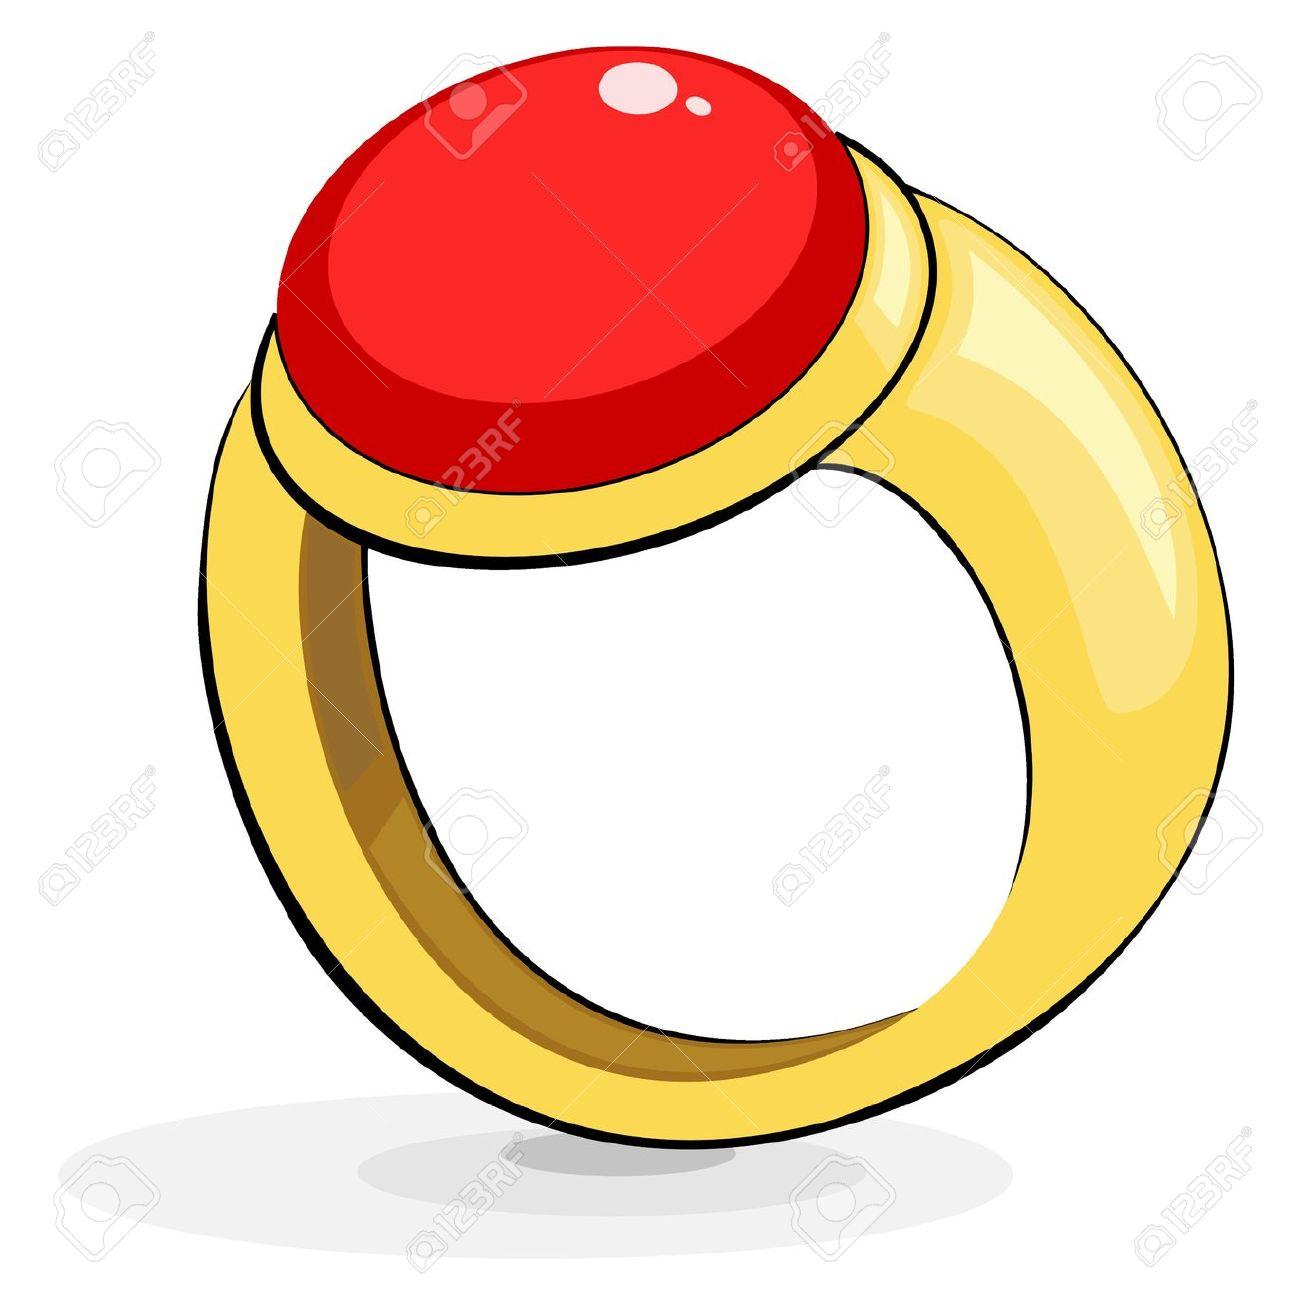 ... Ring Clipart; Ring Clipart-... Ring Clipart; Ring Clipart-12